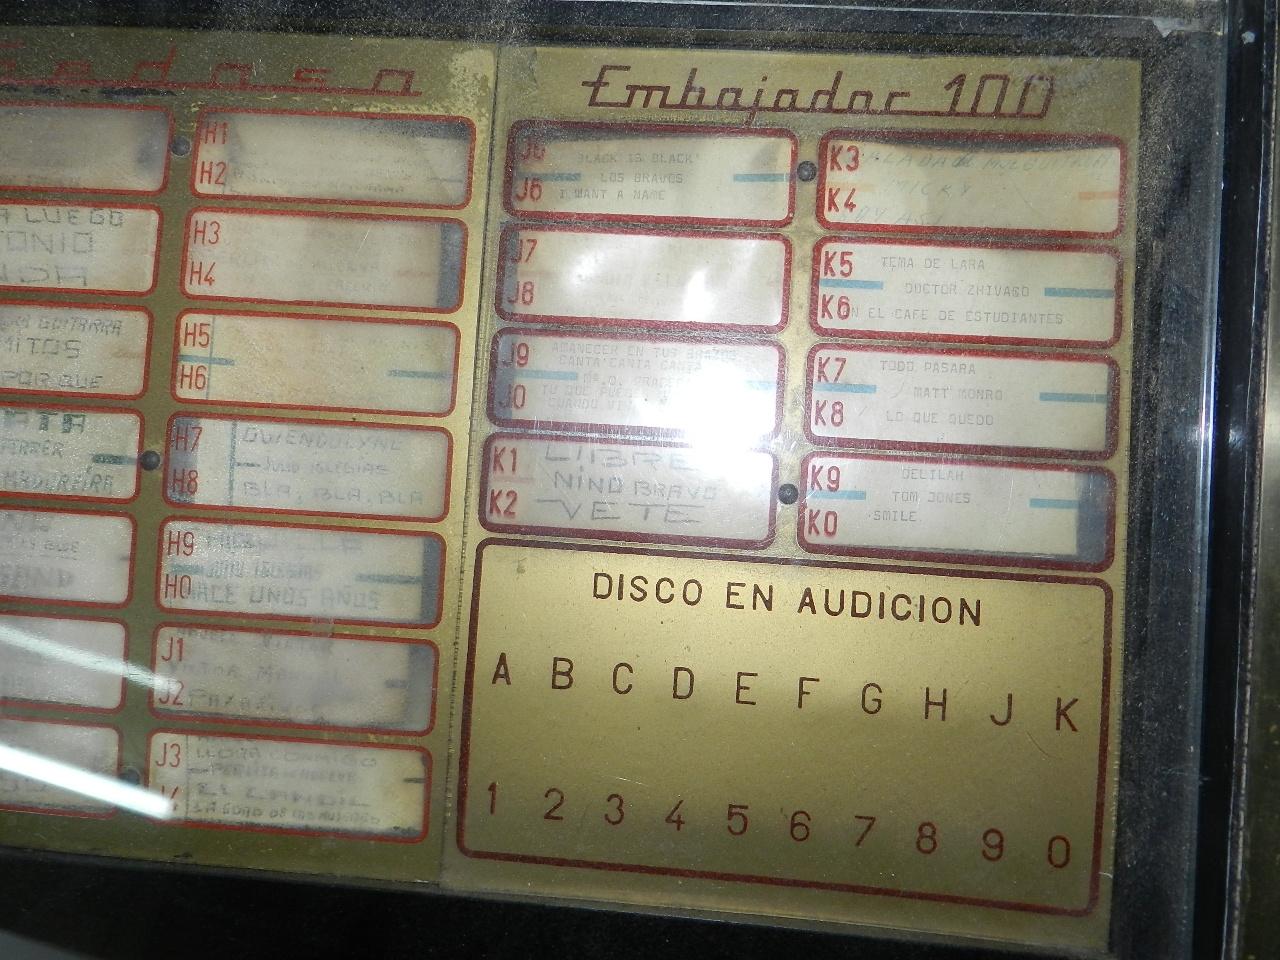 Imagen SINFONOLA GEDASA EMBAJADOR 100 AÑO 1959 34444